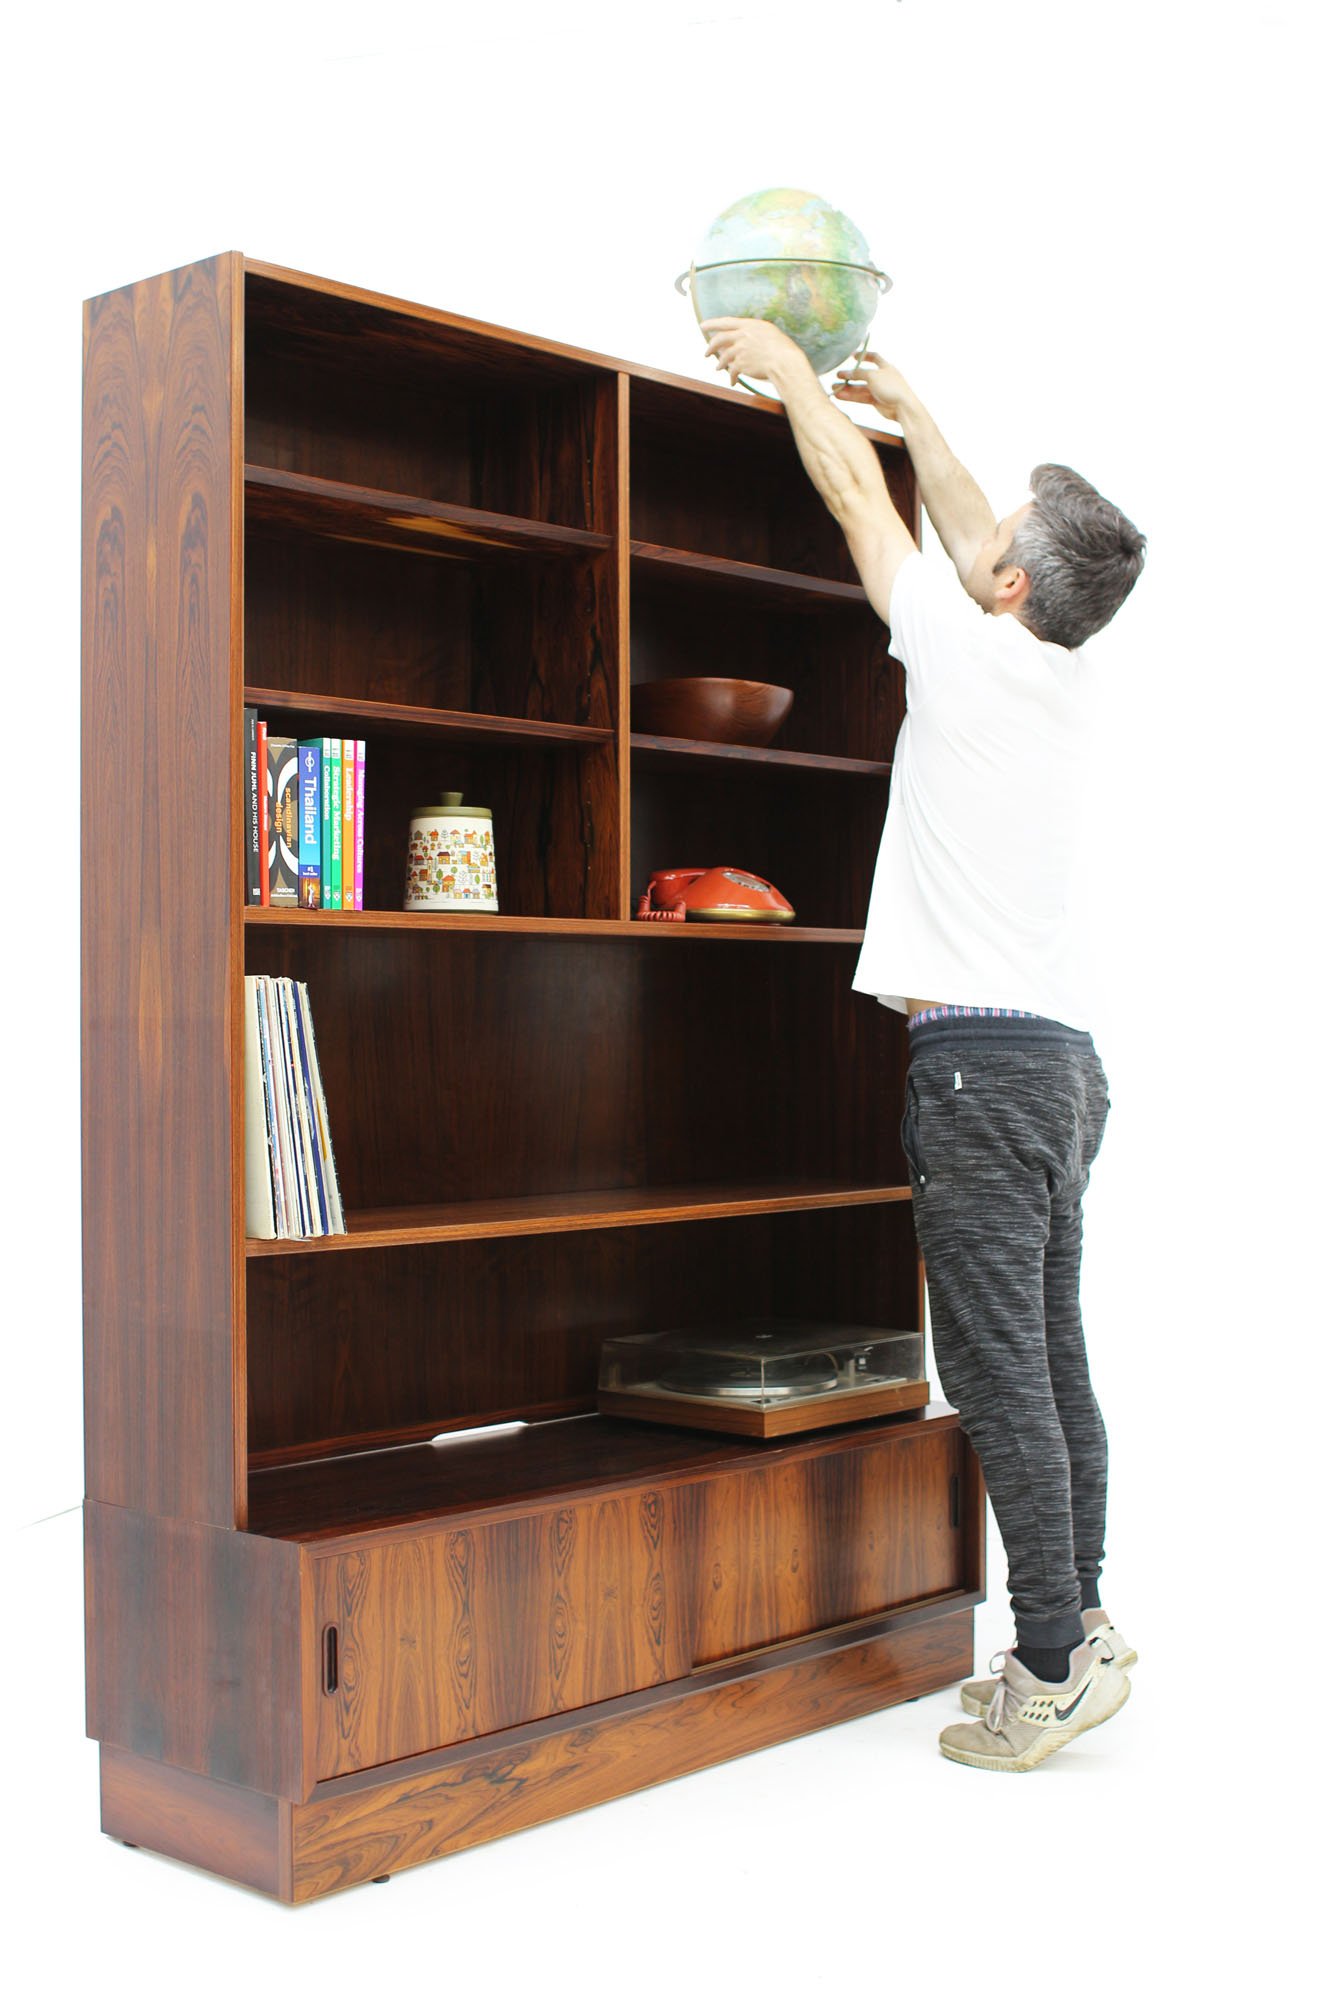 Poul Hundevad Rosewood Bookcase Made in Denmark (2).jpg